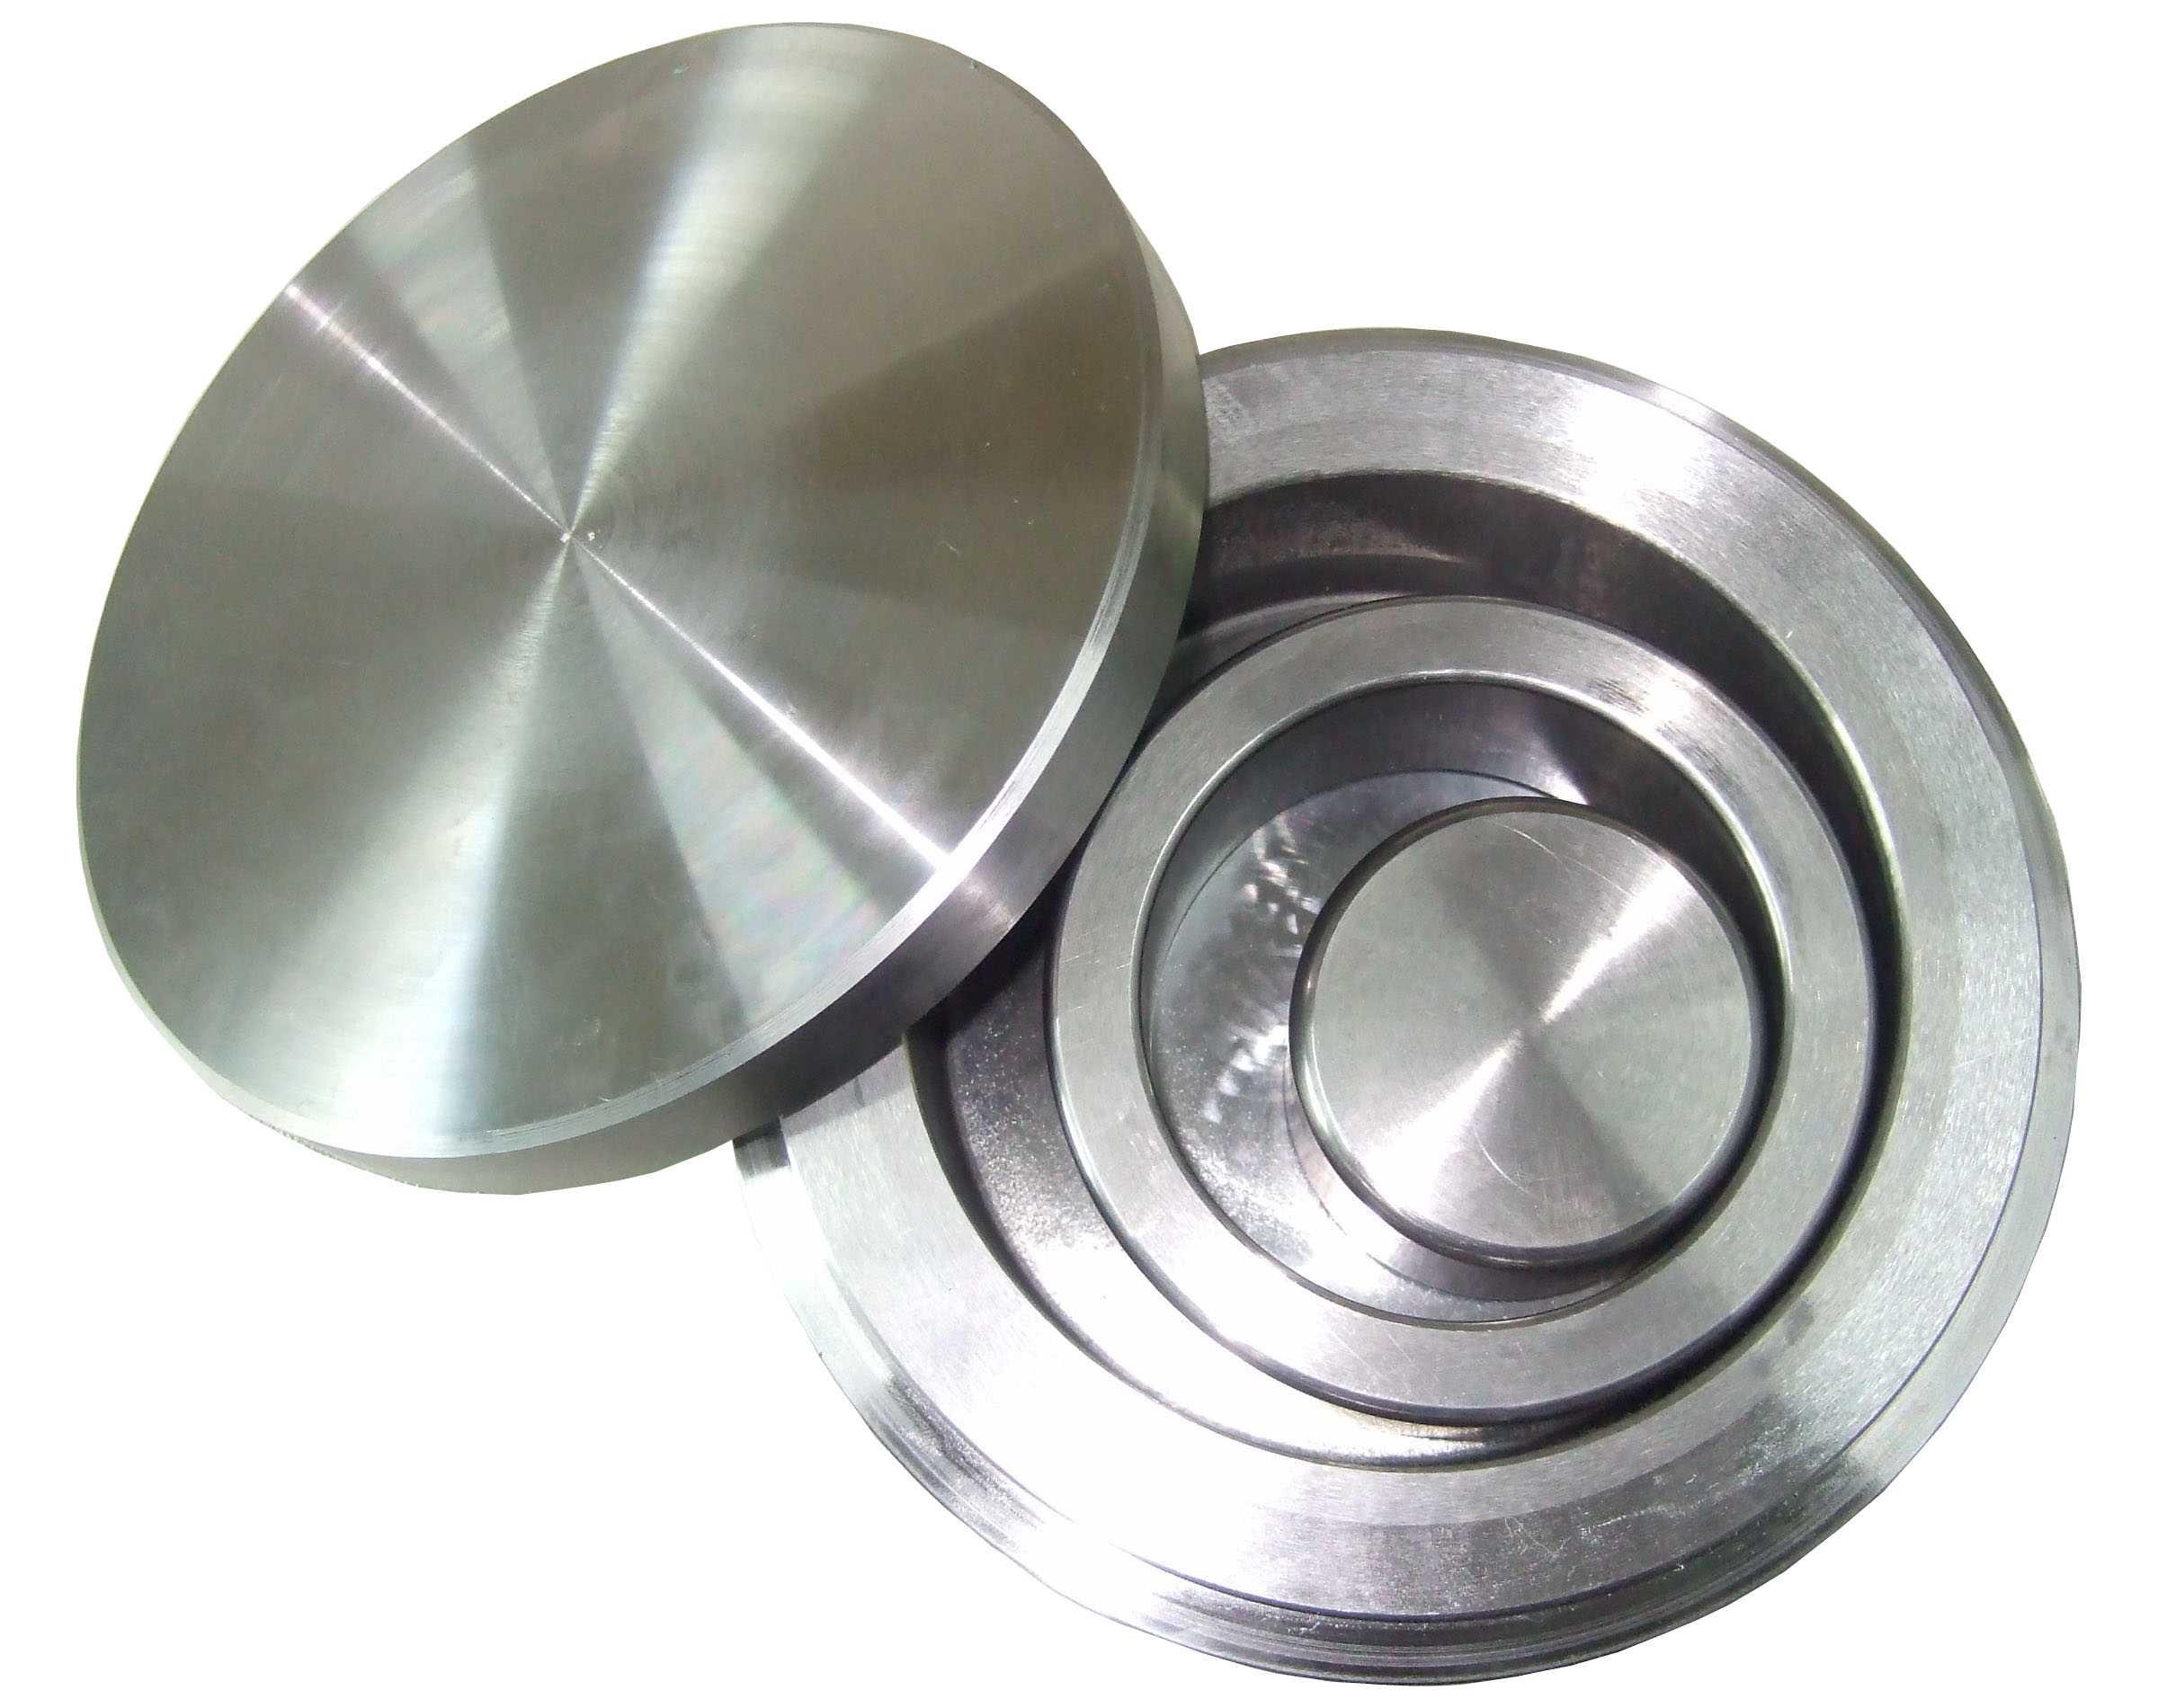 1g/cm3 抗弯强度:2080mpa    碳化钨磨盘结构:该磨盘属镶嵌式结构 另